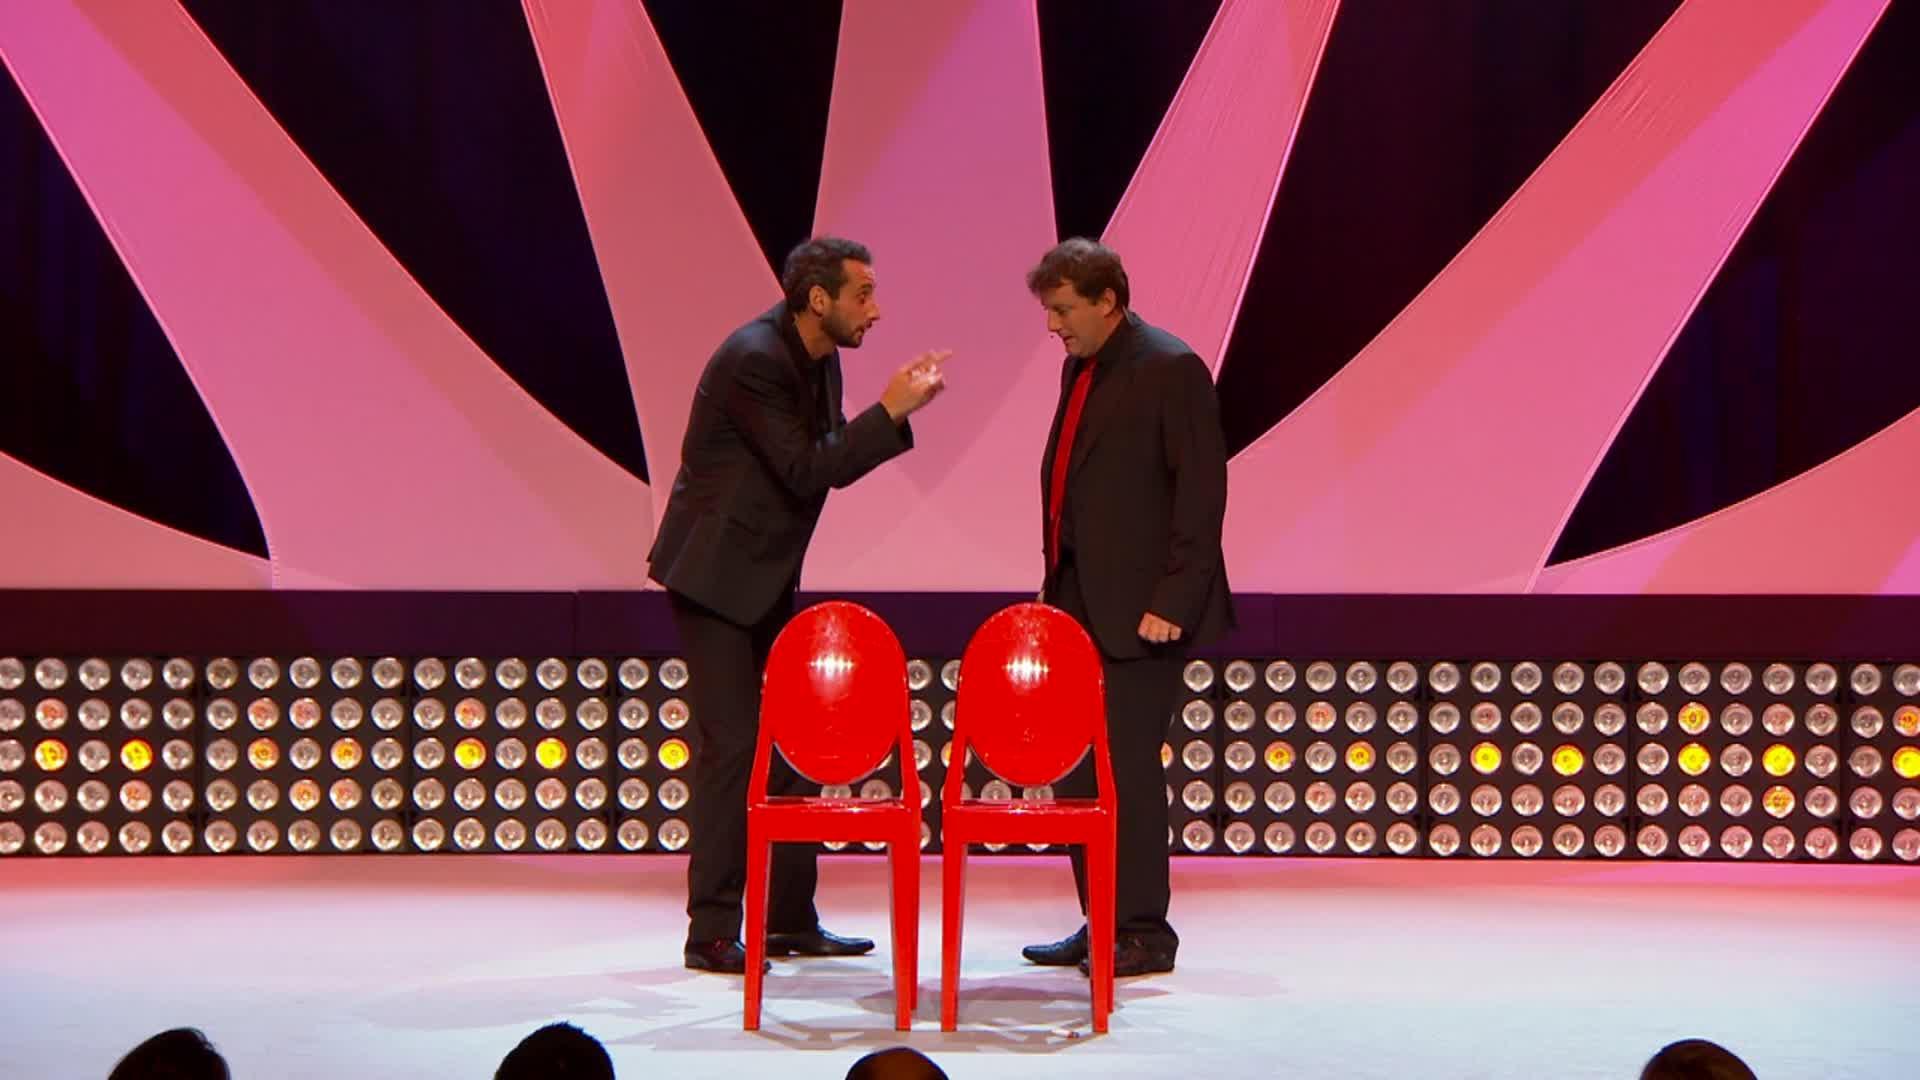 Arnaud Cosson et Cyril Ledooublée - Les homos